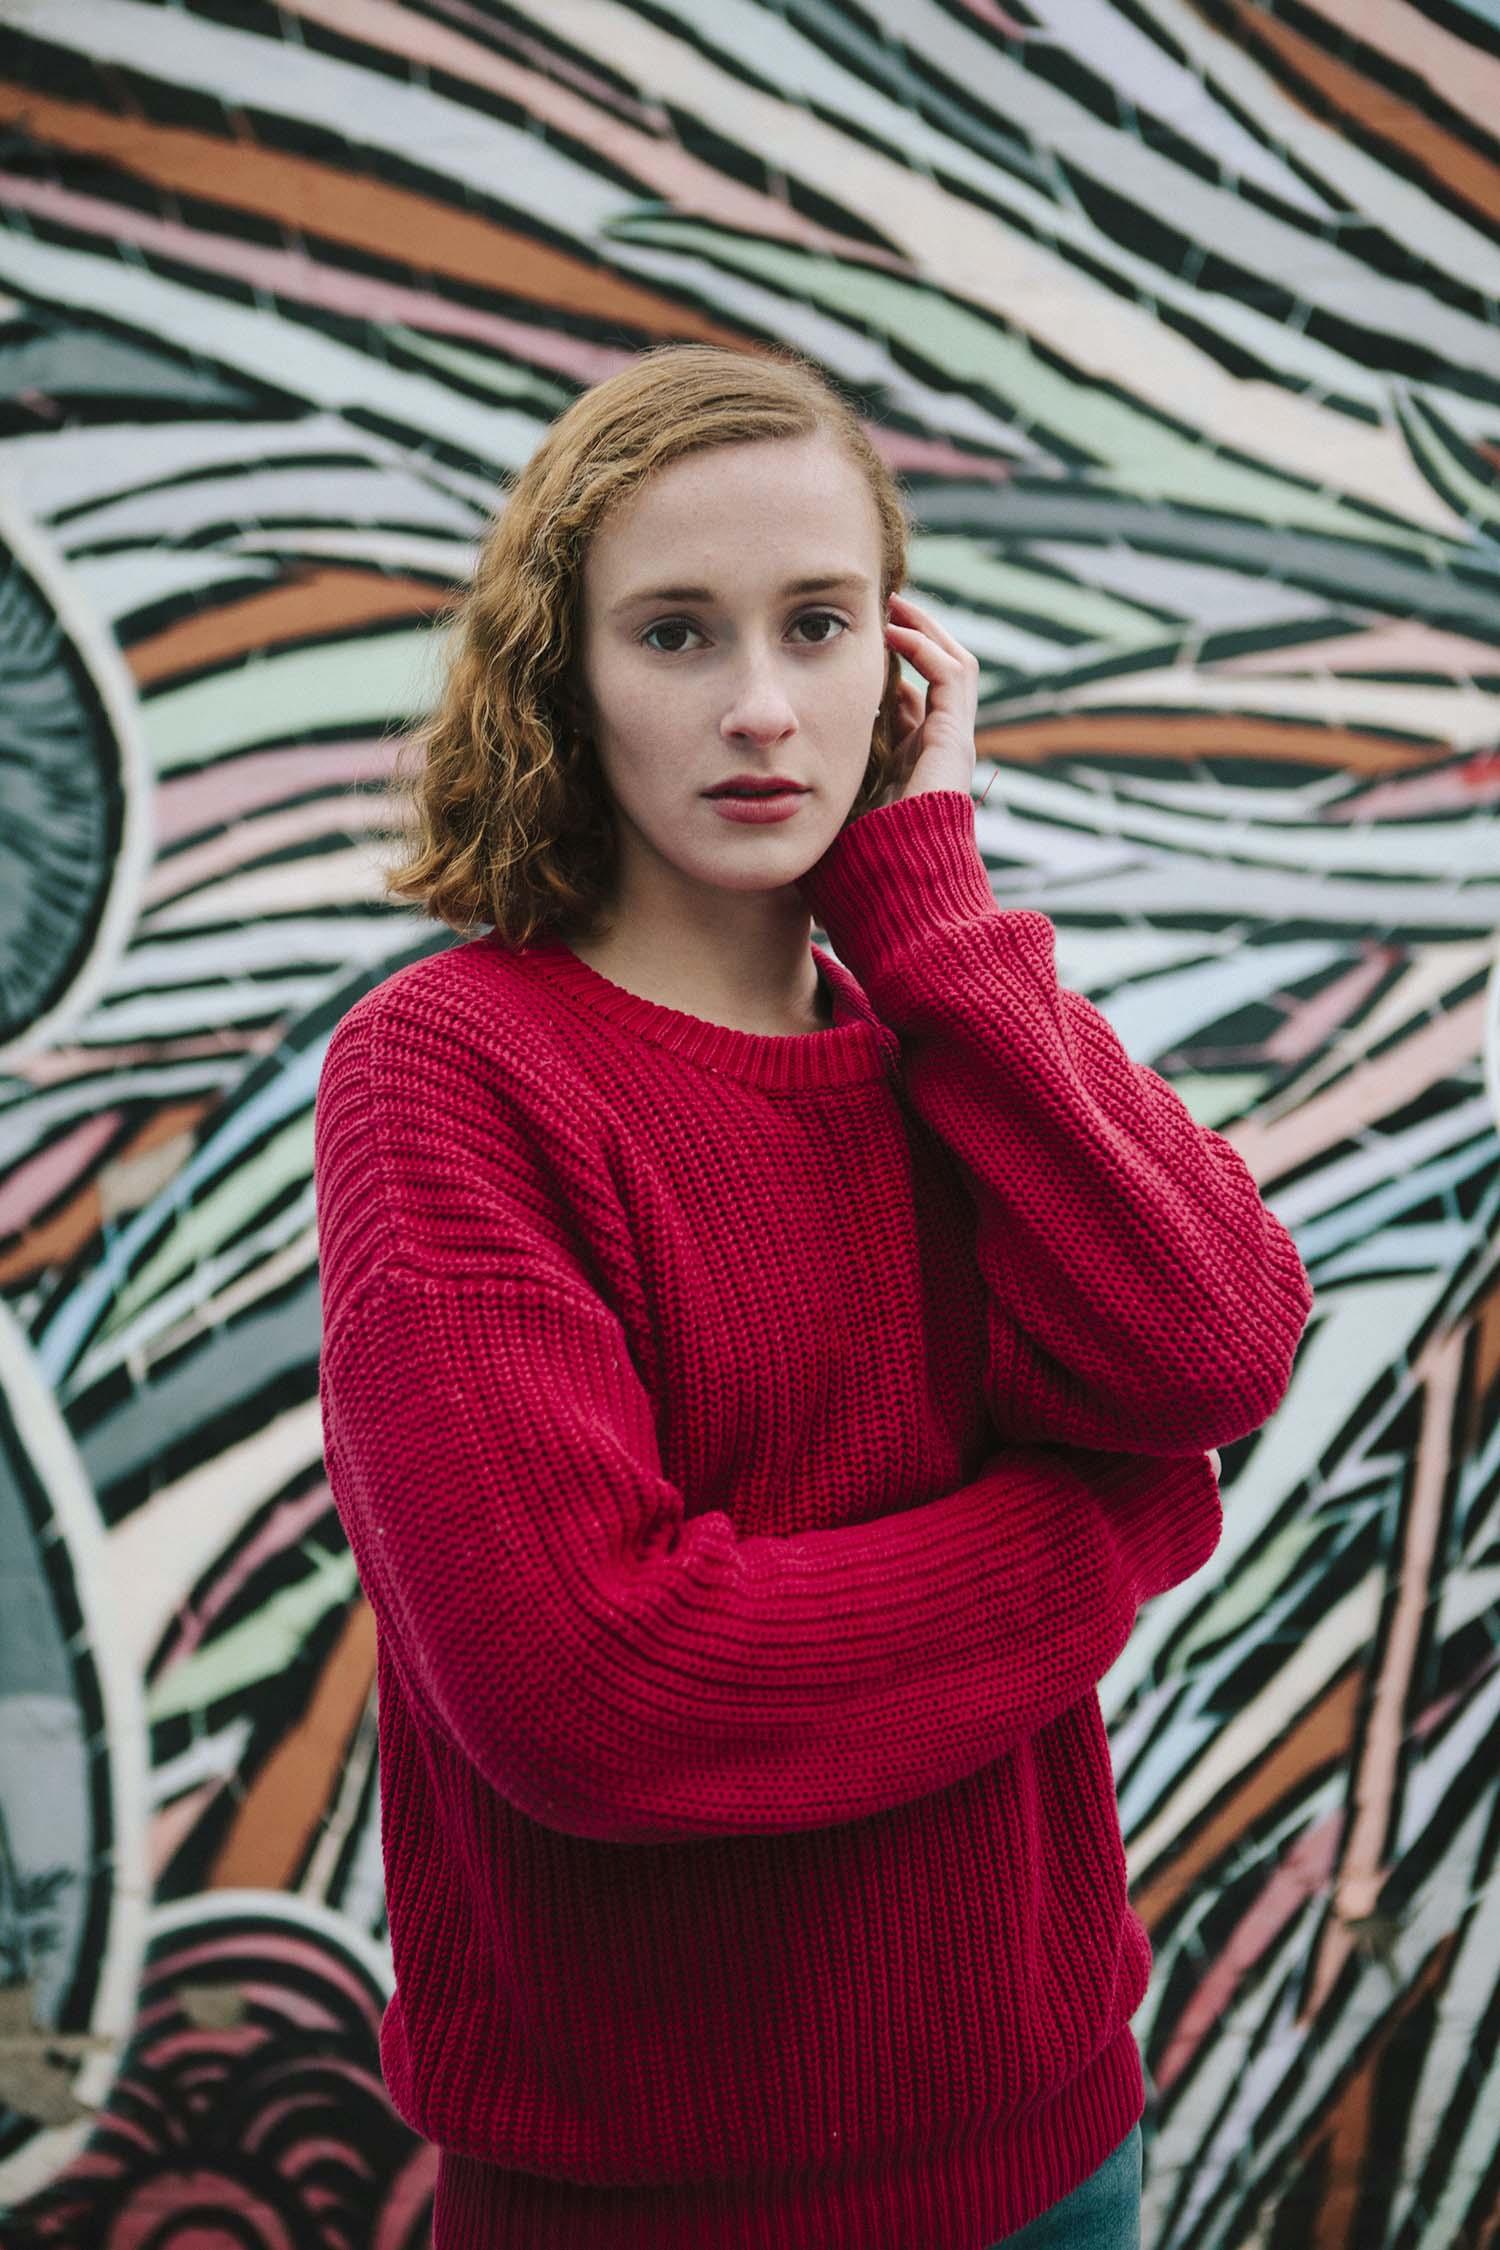 Woman in red sweater posing graffiti mural, Minneapolis Minnesota Commercial Portrait Photographers headshots